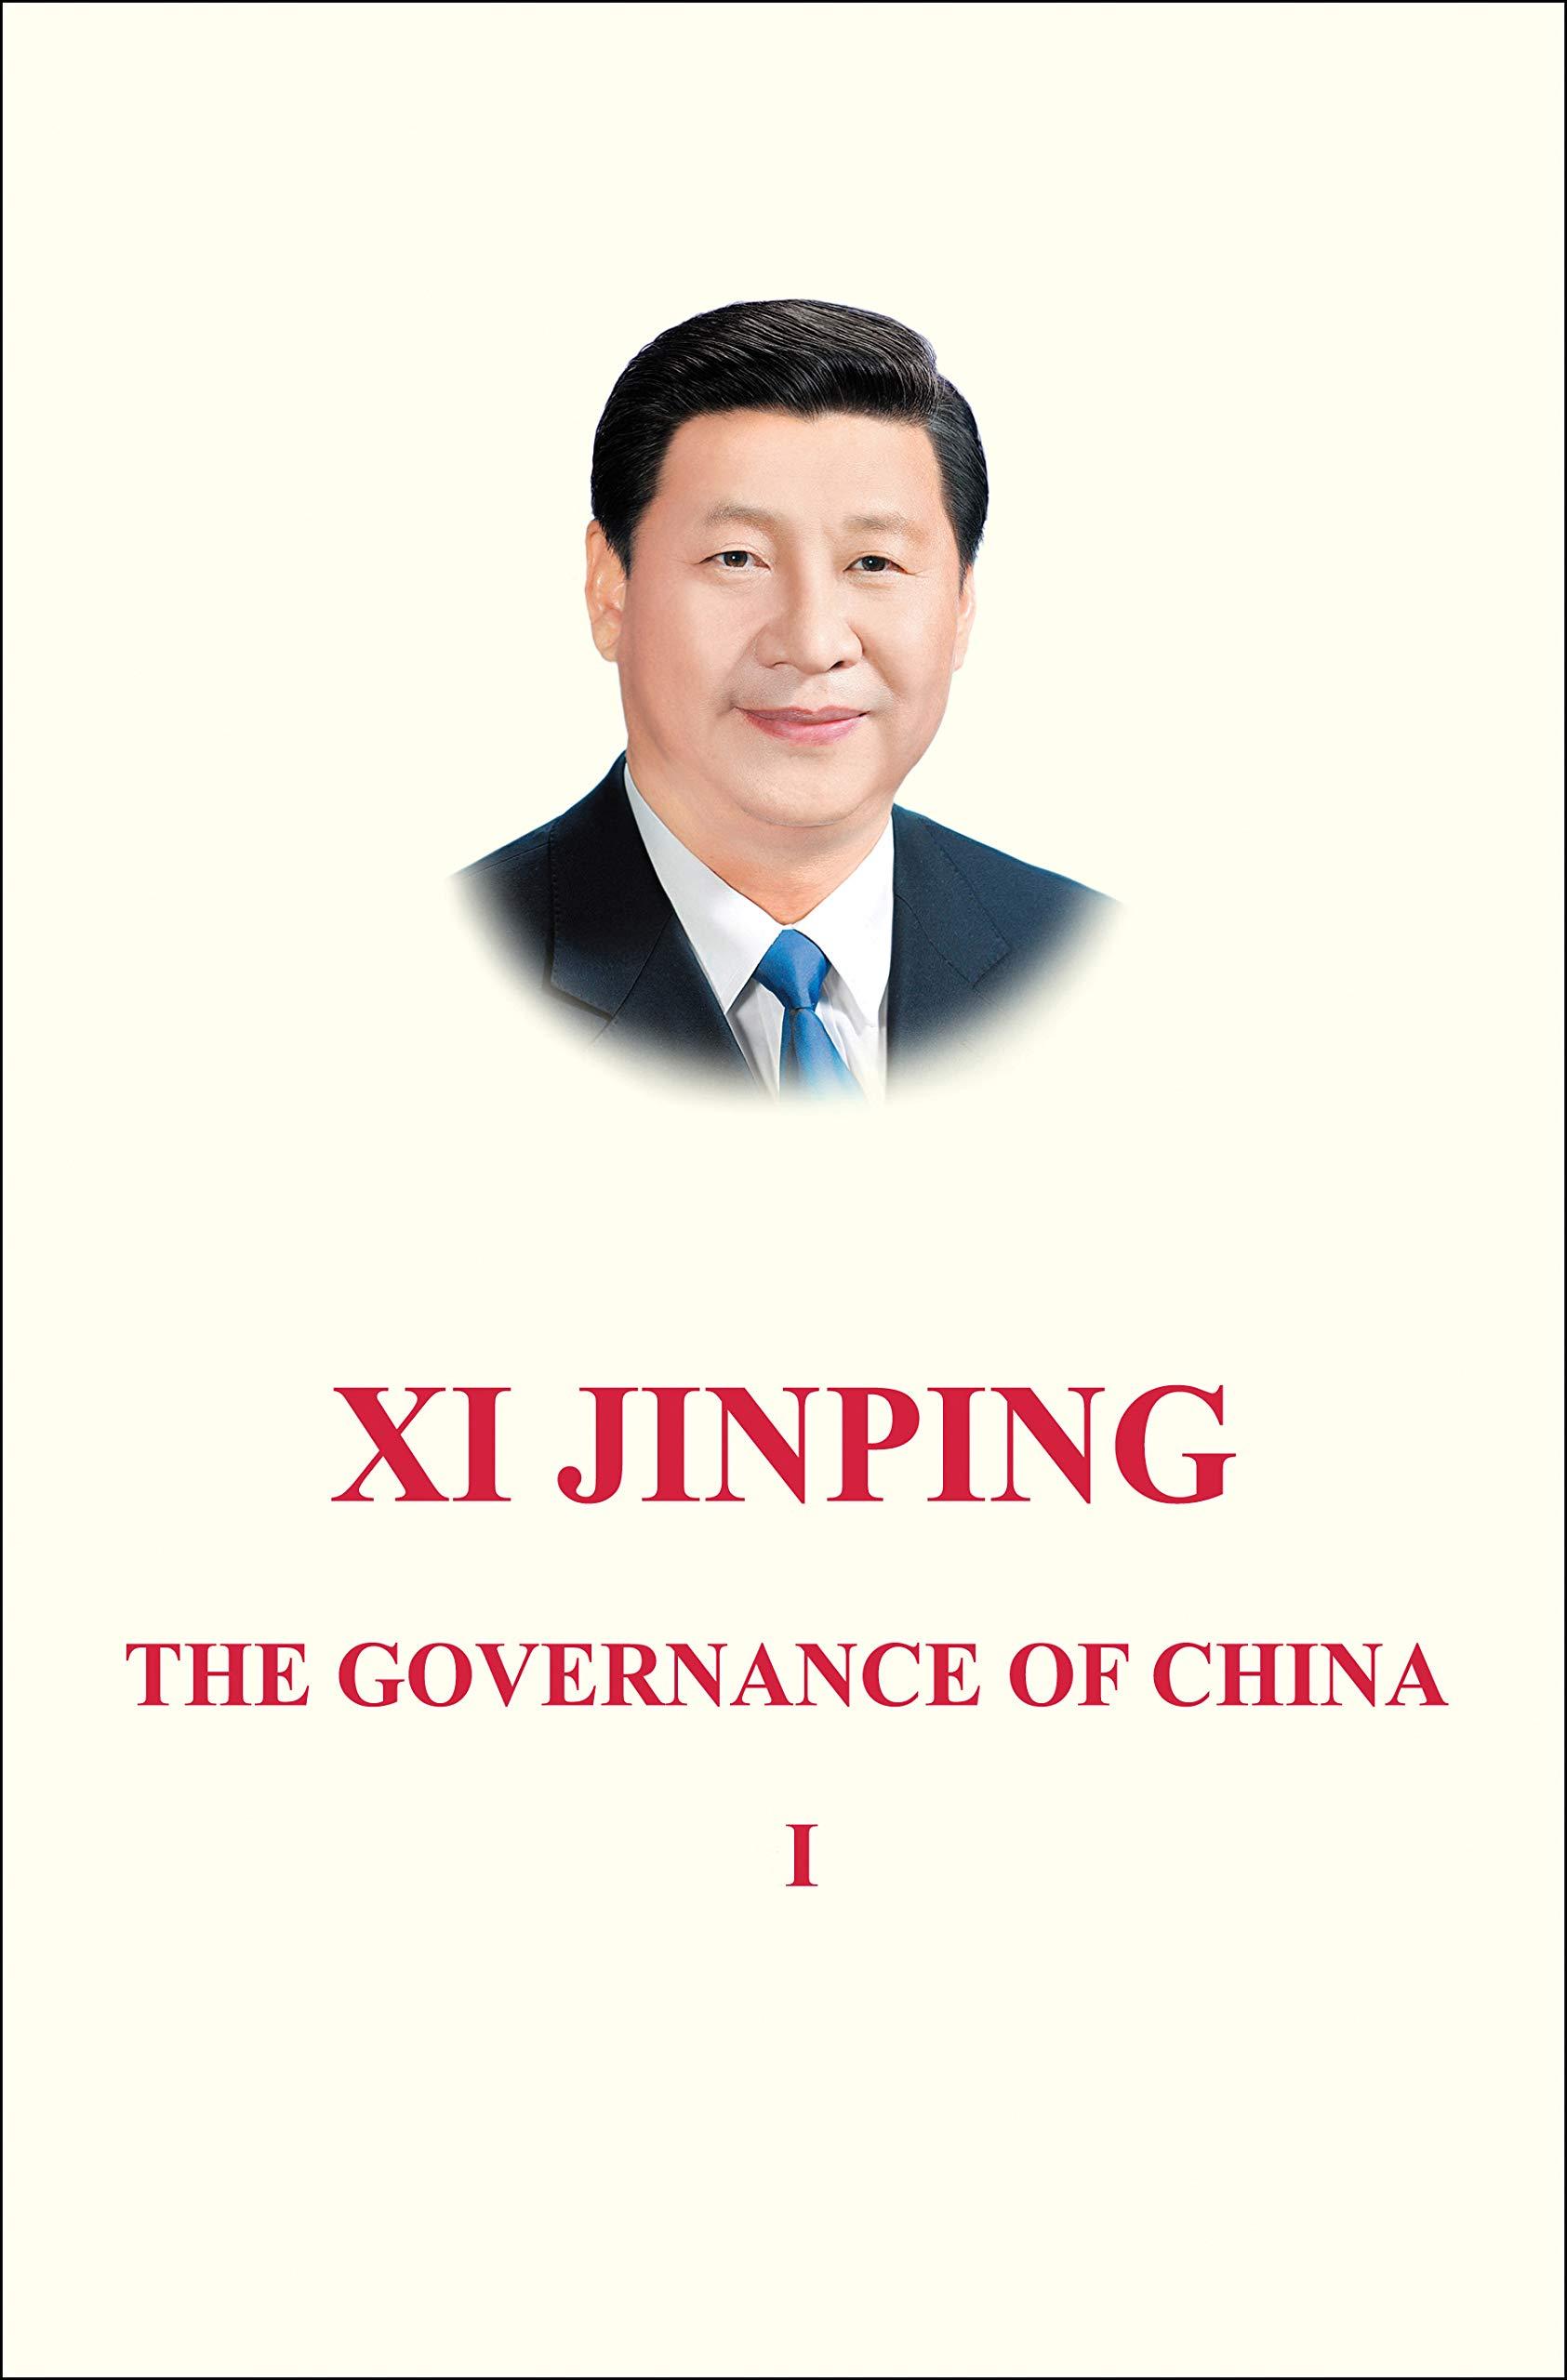 Xi Jinping The Governance of China